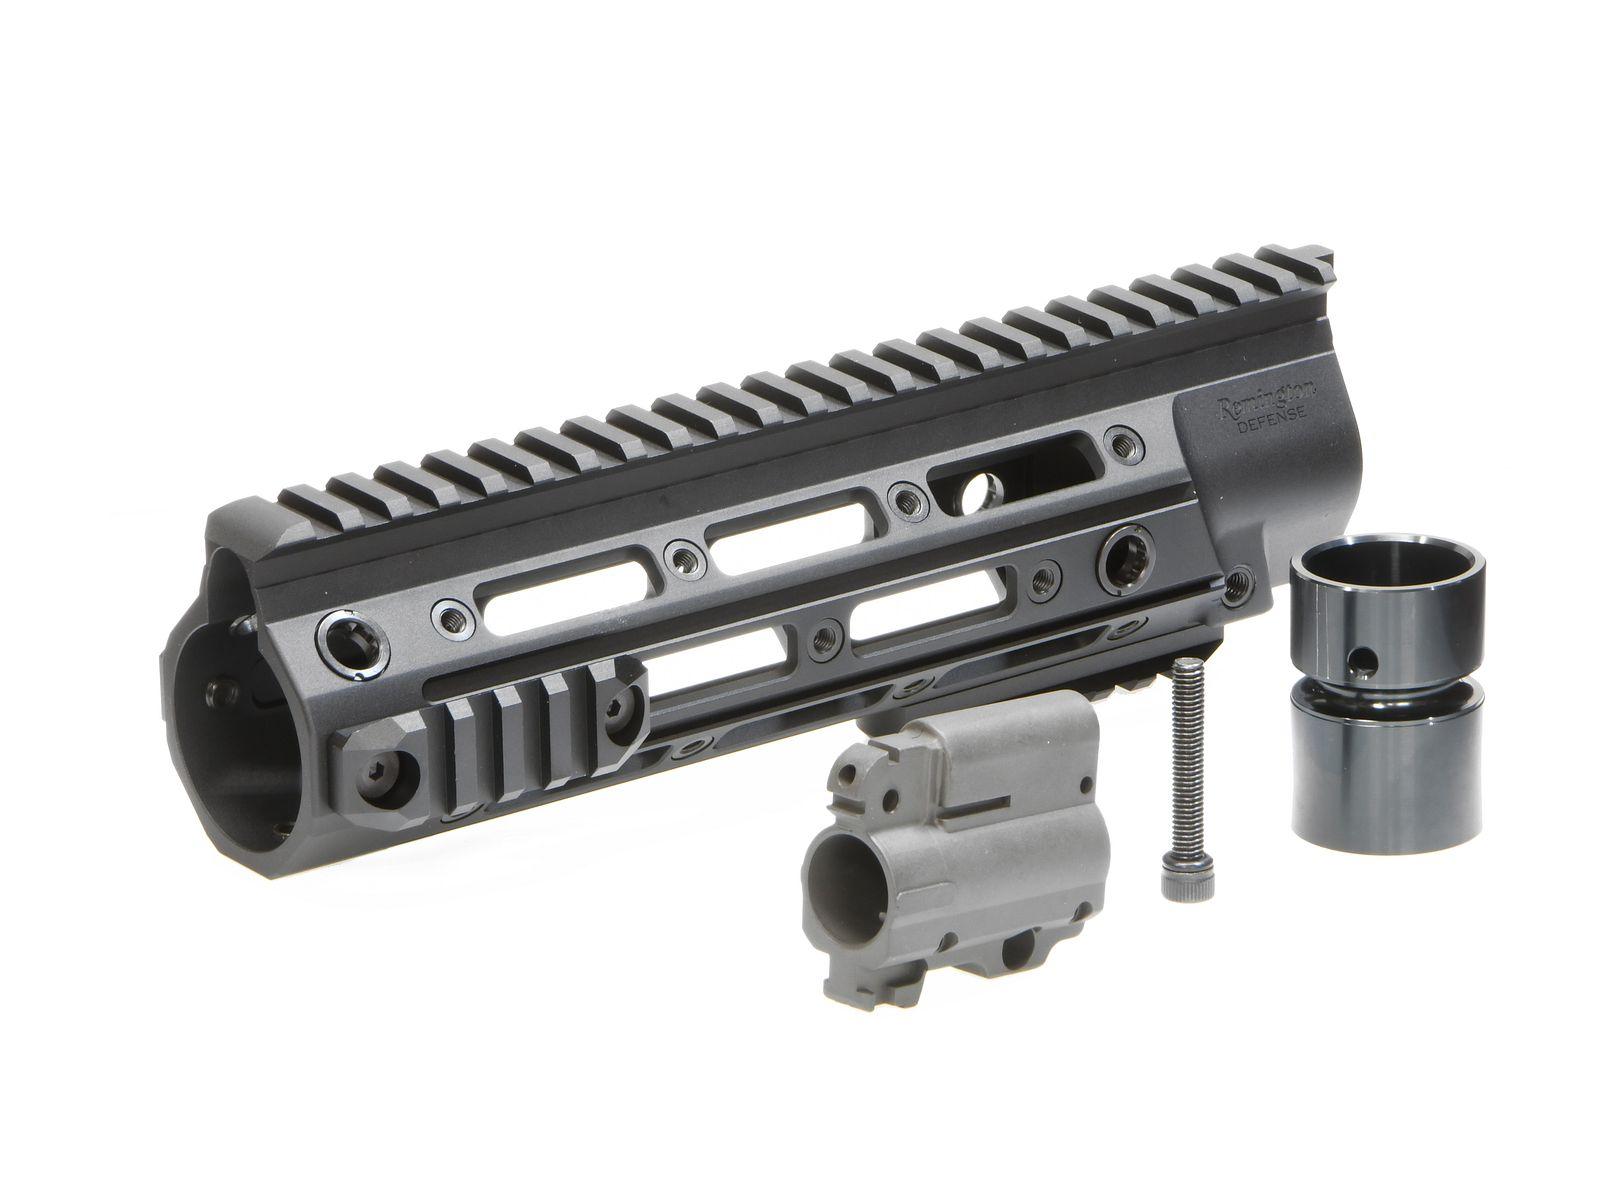 VFC HK416 RAHG Remingtonレイルハンドガードセット (Gen.2)